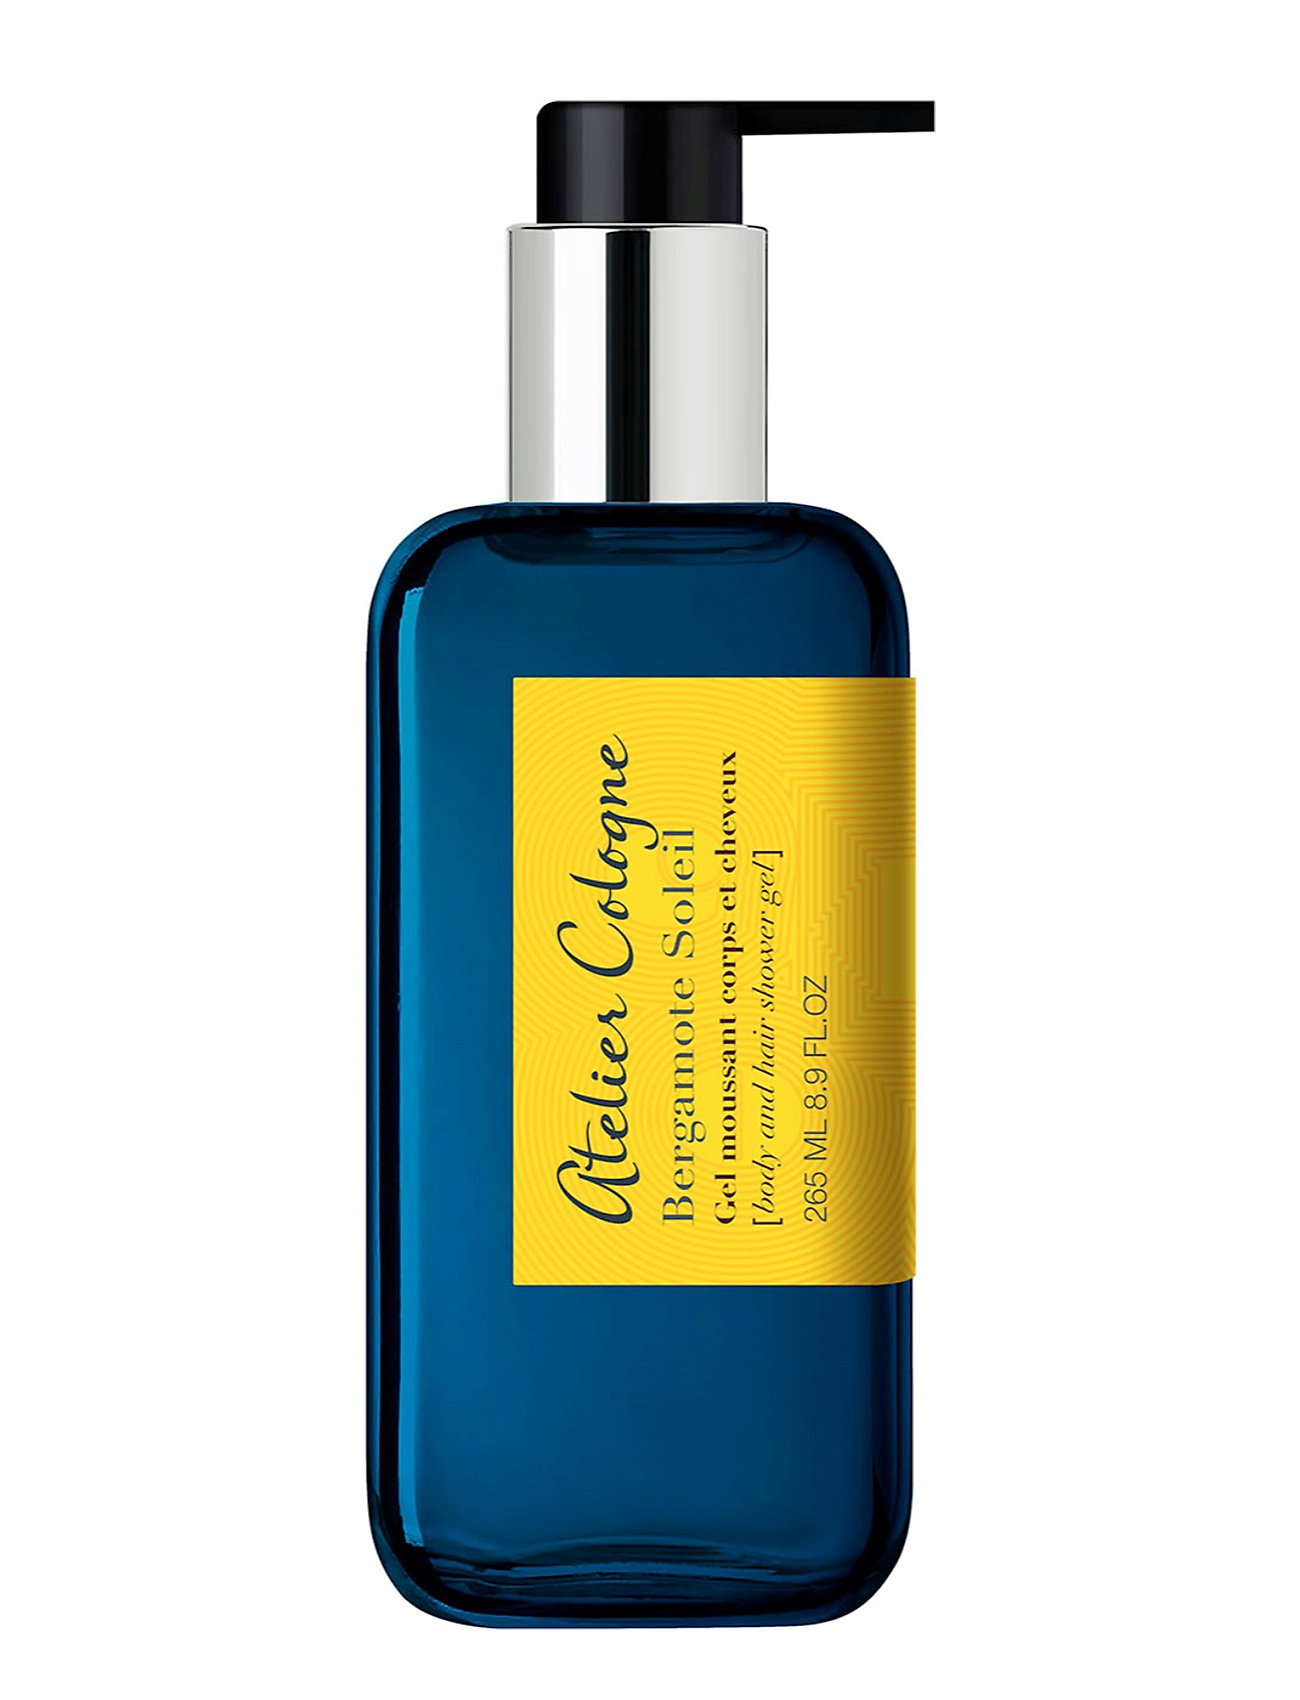 atelier cologne – Bergamote solei body & hair shampoo 265 fra boozt.com dk